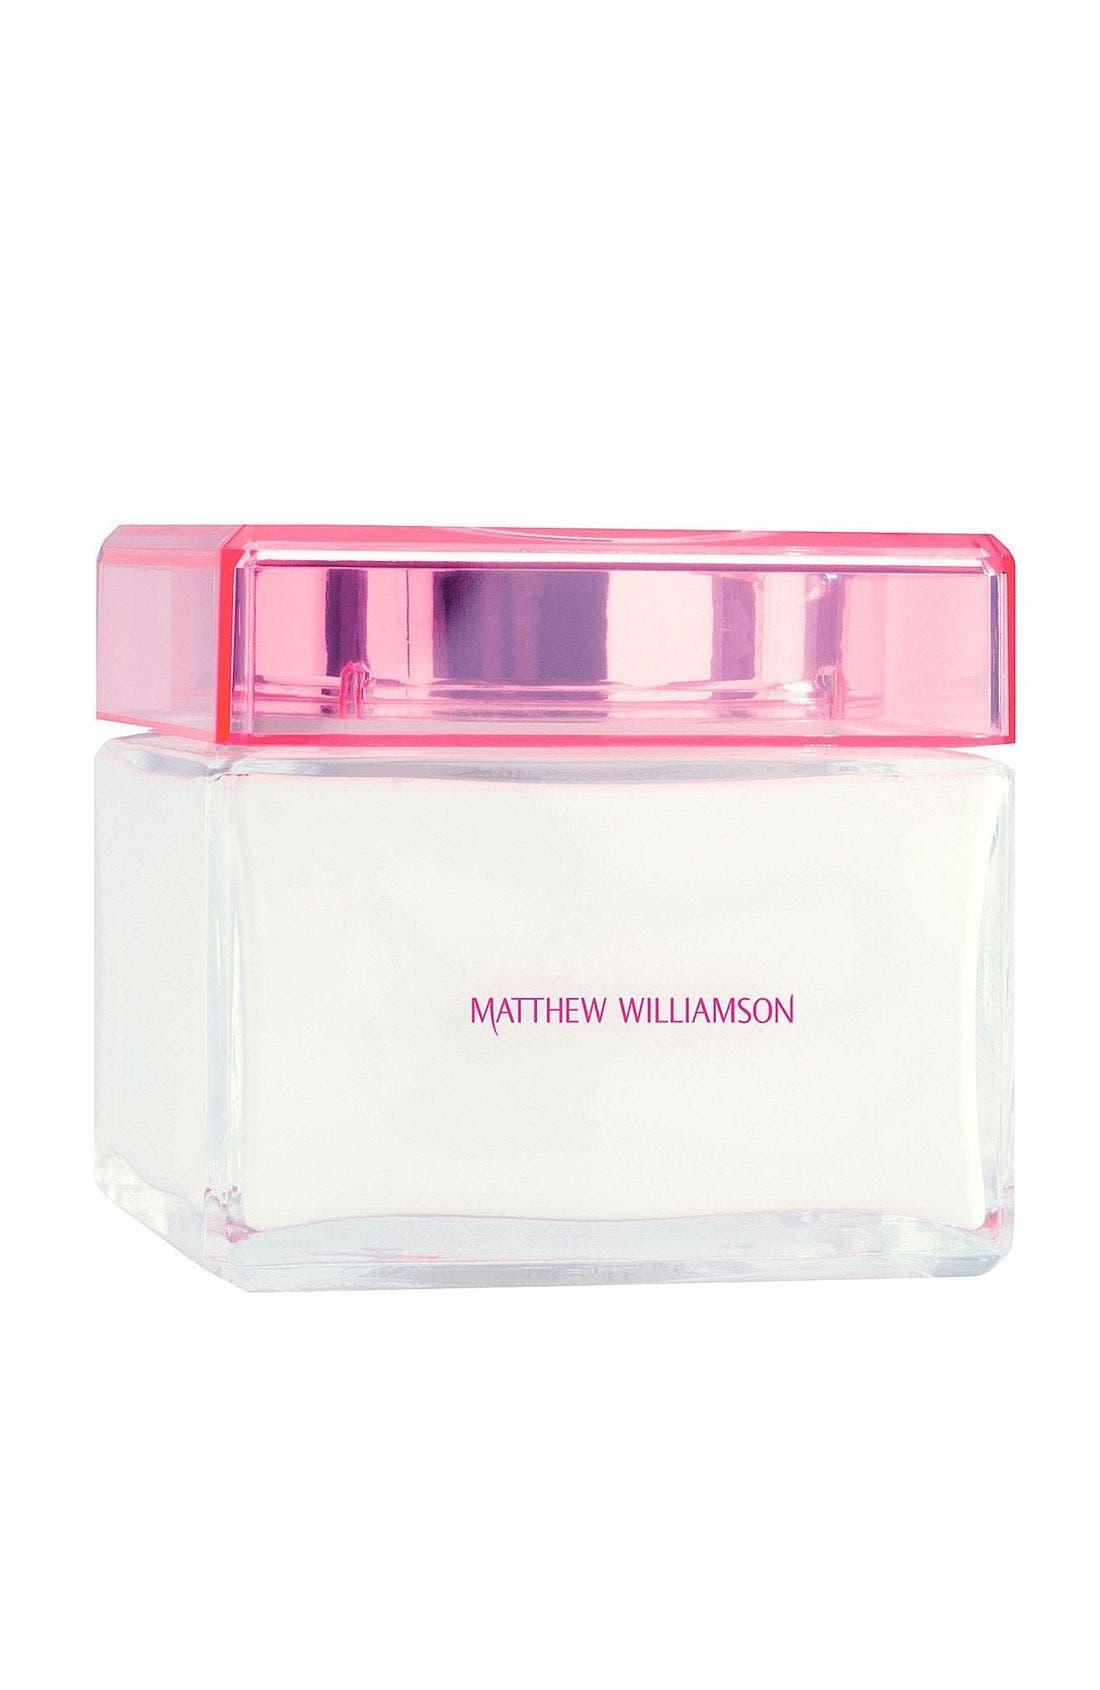 Matthew Williamson Luxurious Body Cream,                             Main thumbnail 1, color,                             000